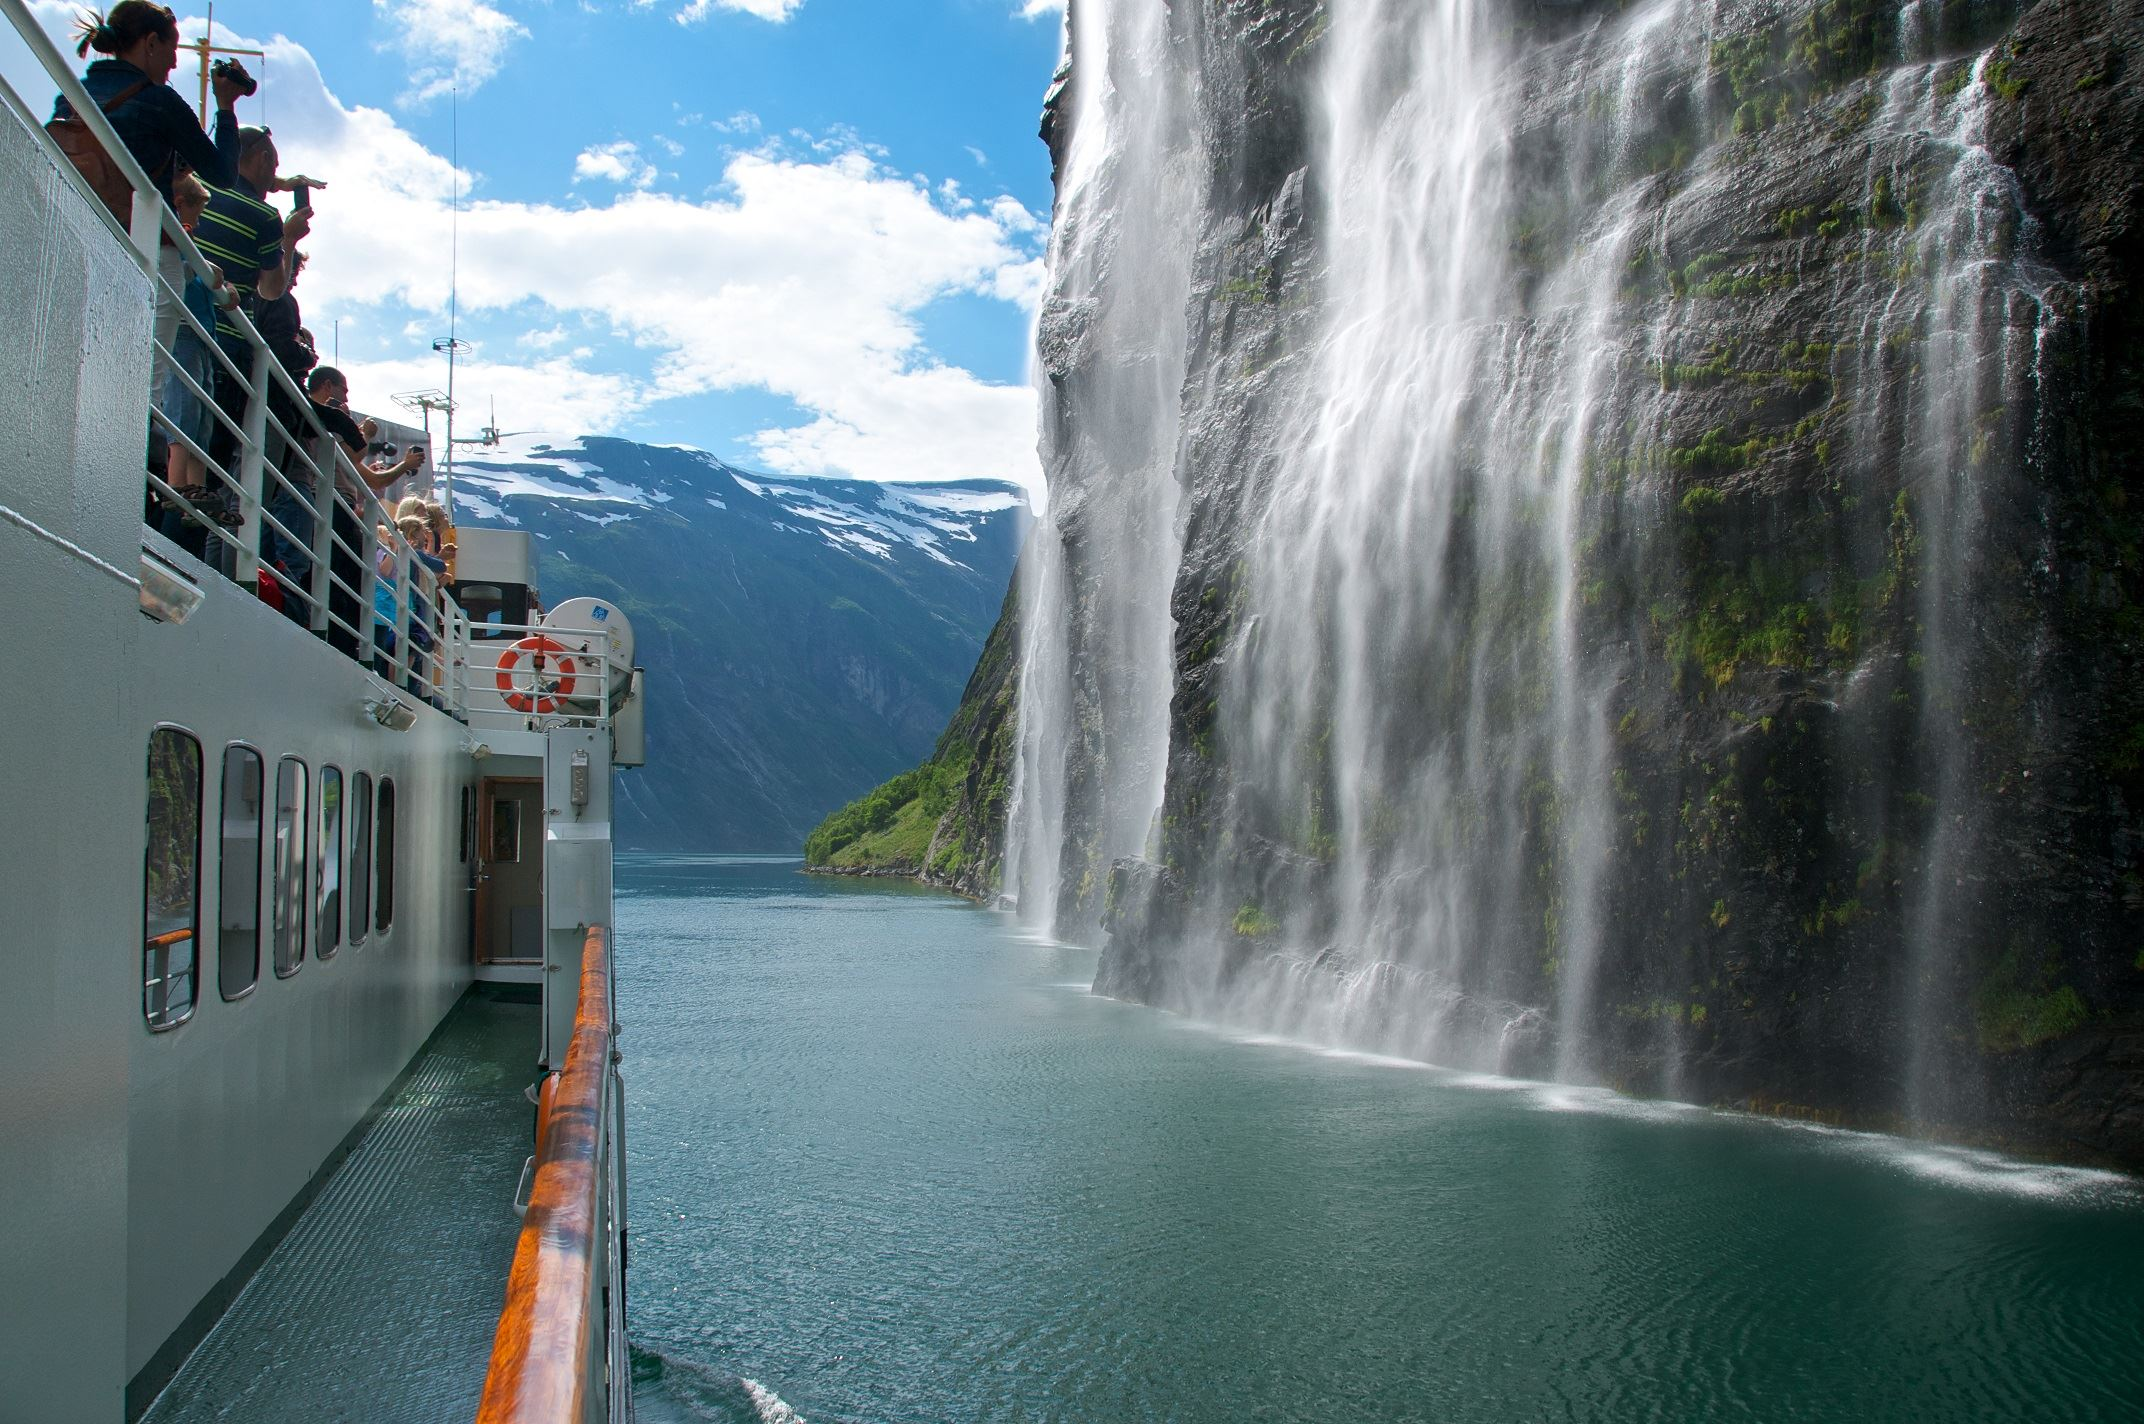 Øyvind Heen - Visitnorway.com, Fjord Cruise Geirangerfjord